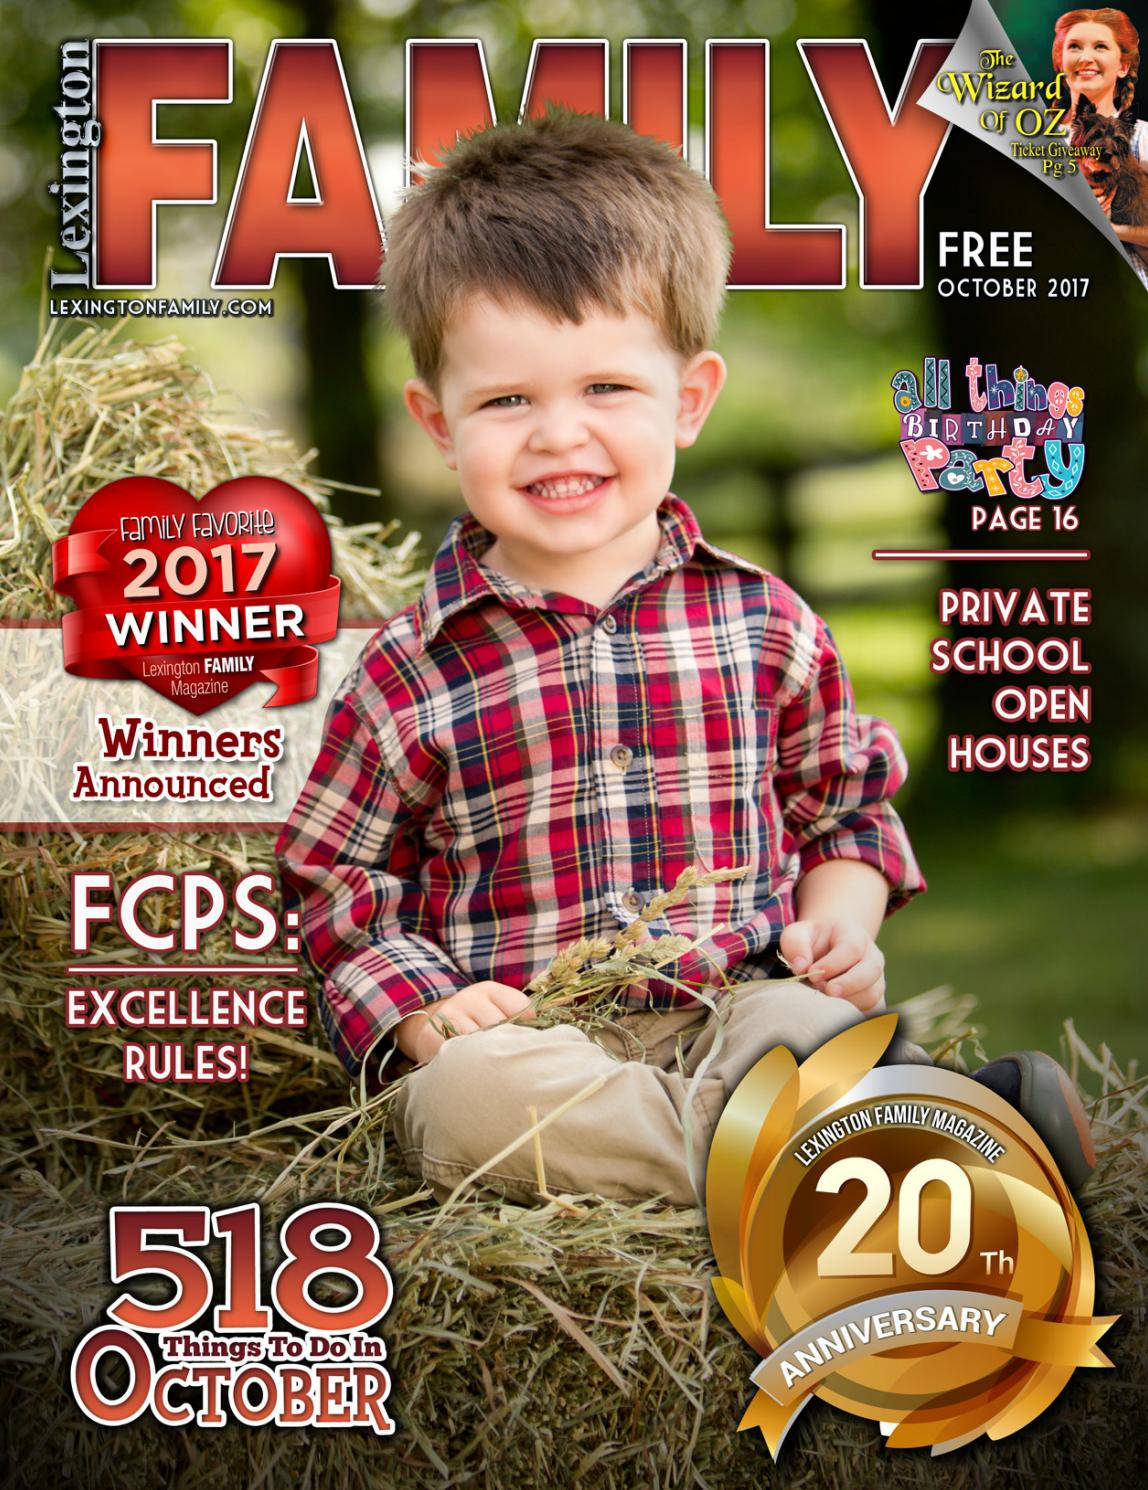 Oct 17 Issuu By Lexington Family Magazine